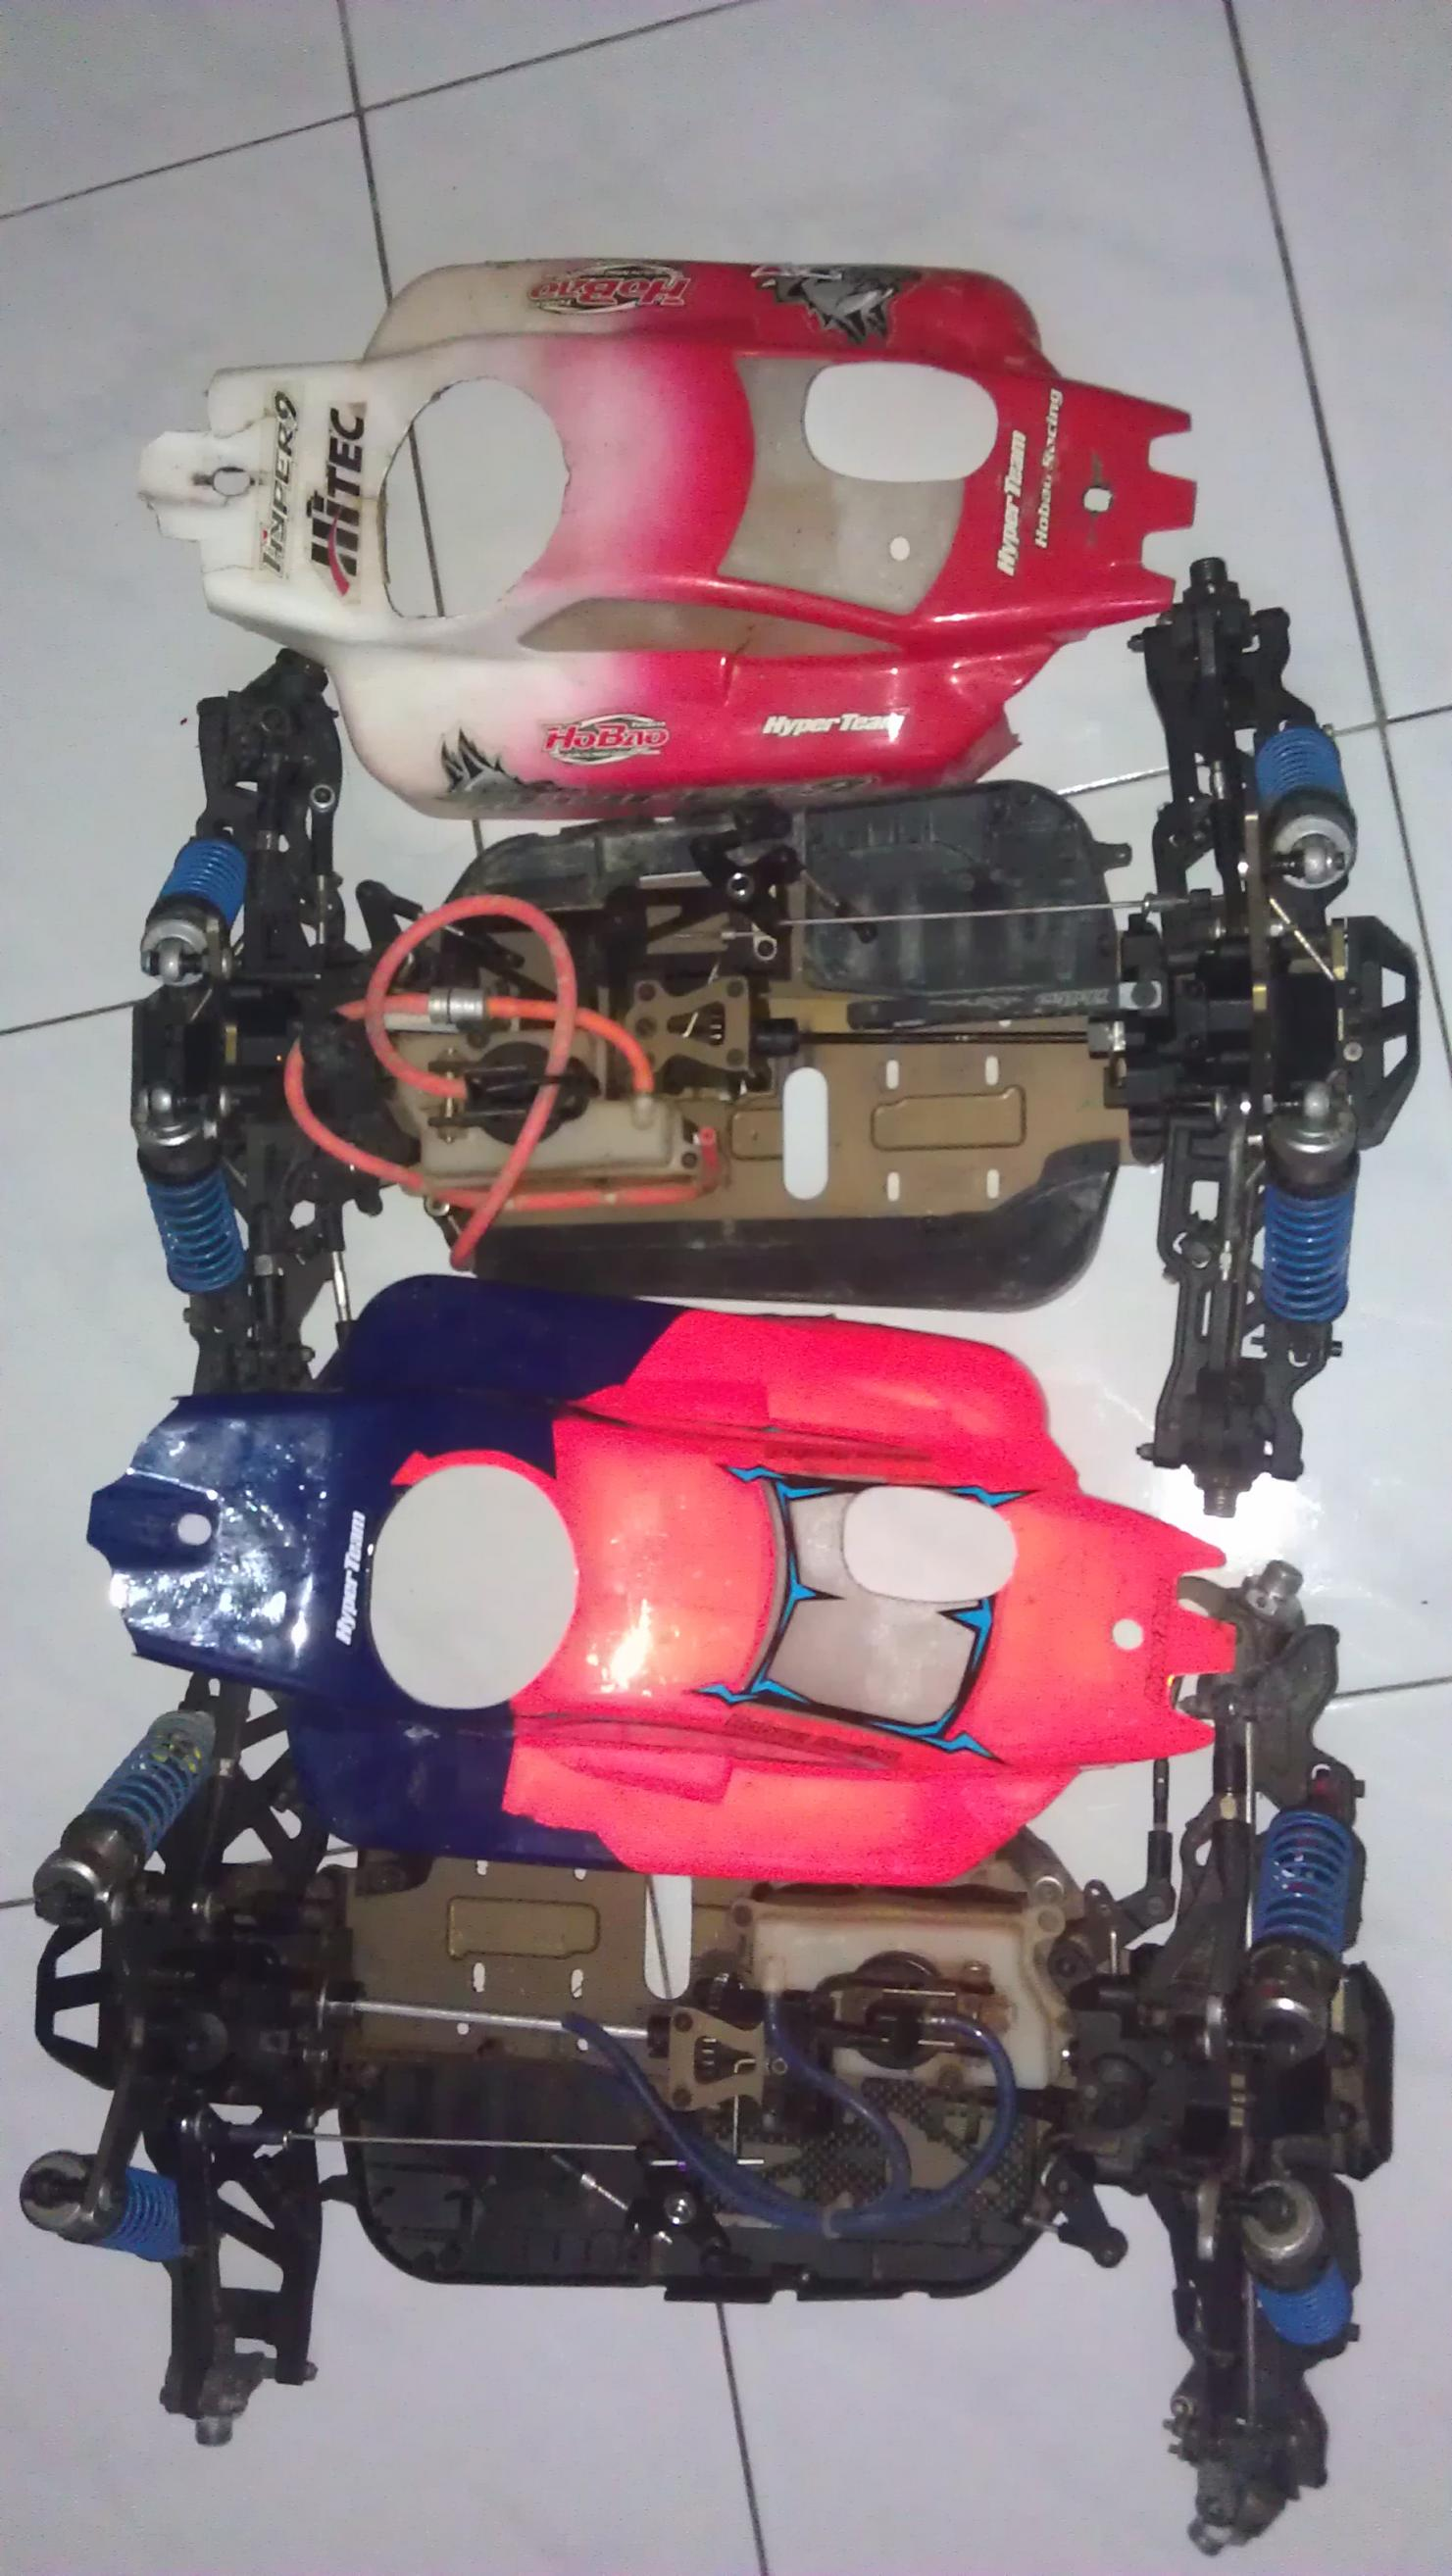 quit rc sale  hyper 9 1:8 pro kit buggy, sanwa MT4 and alpha